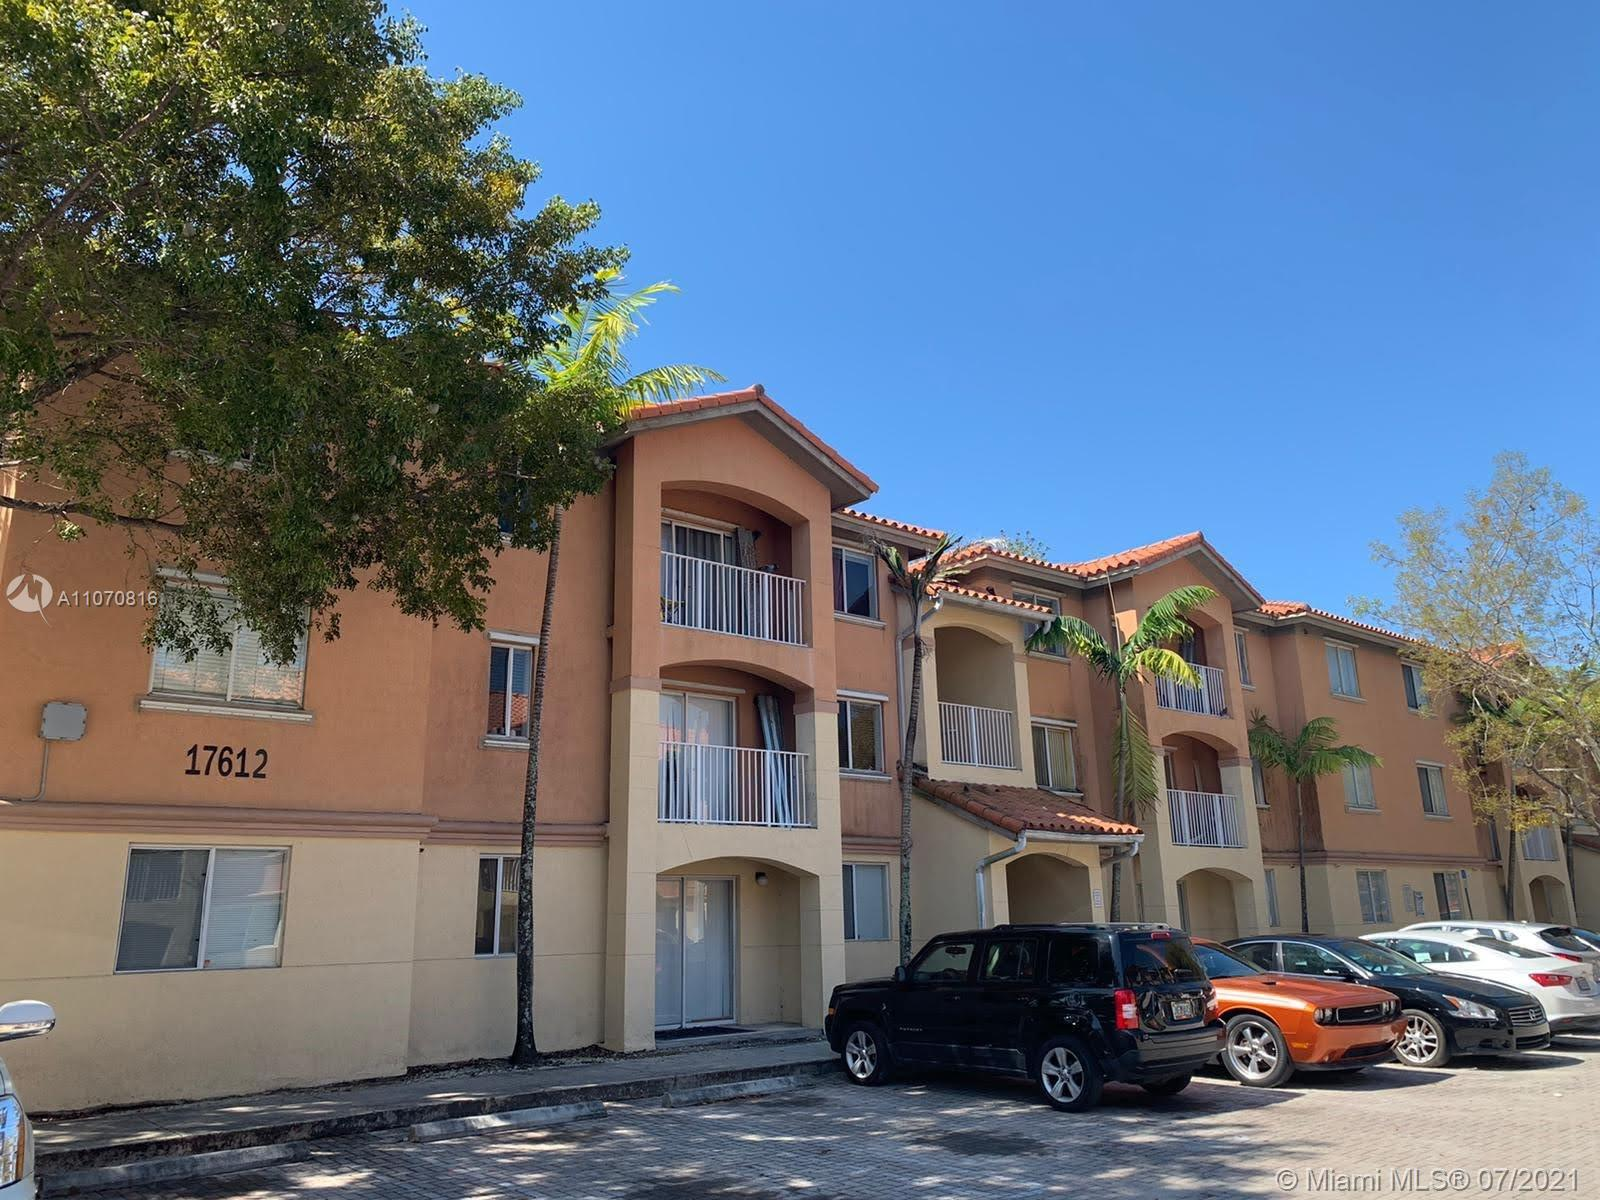 17612 25th Ave Unit 304, Miami Gardens, Florida 33056